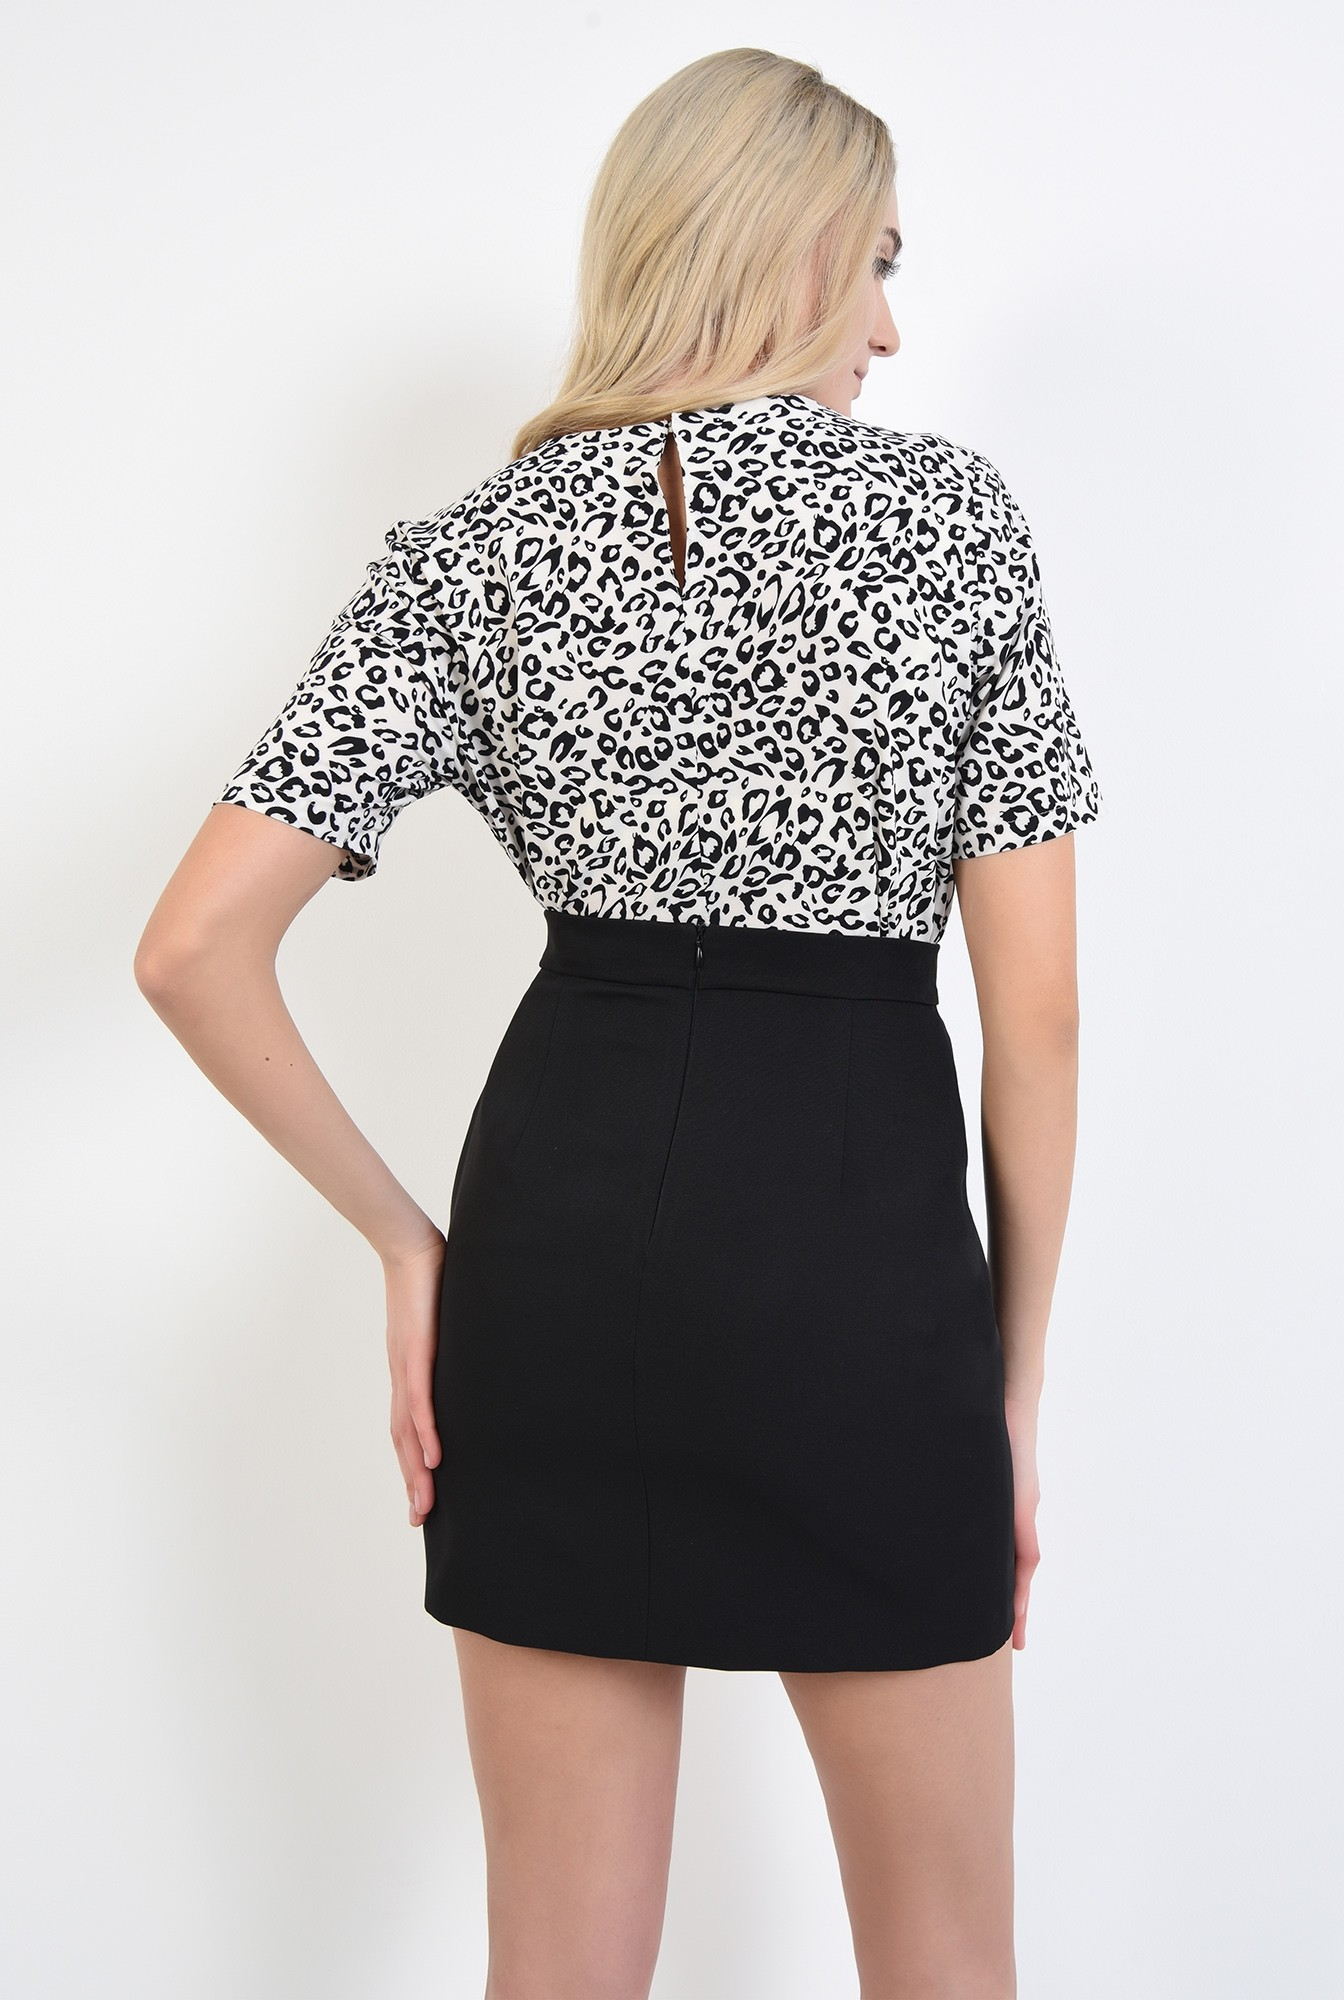 1 - bluze online, bluza de zi, imprimeu leopard, alb-negru, decolteu rotund la baza gatului